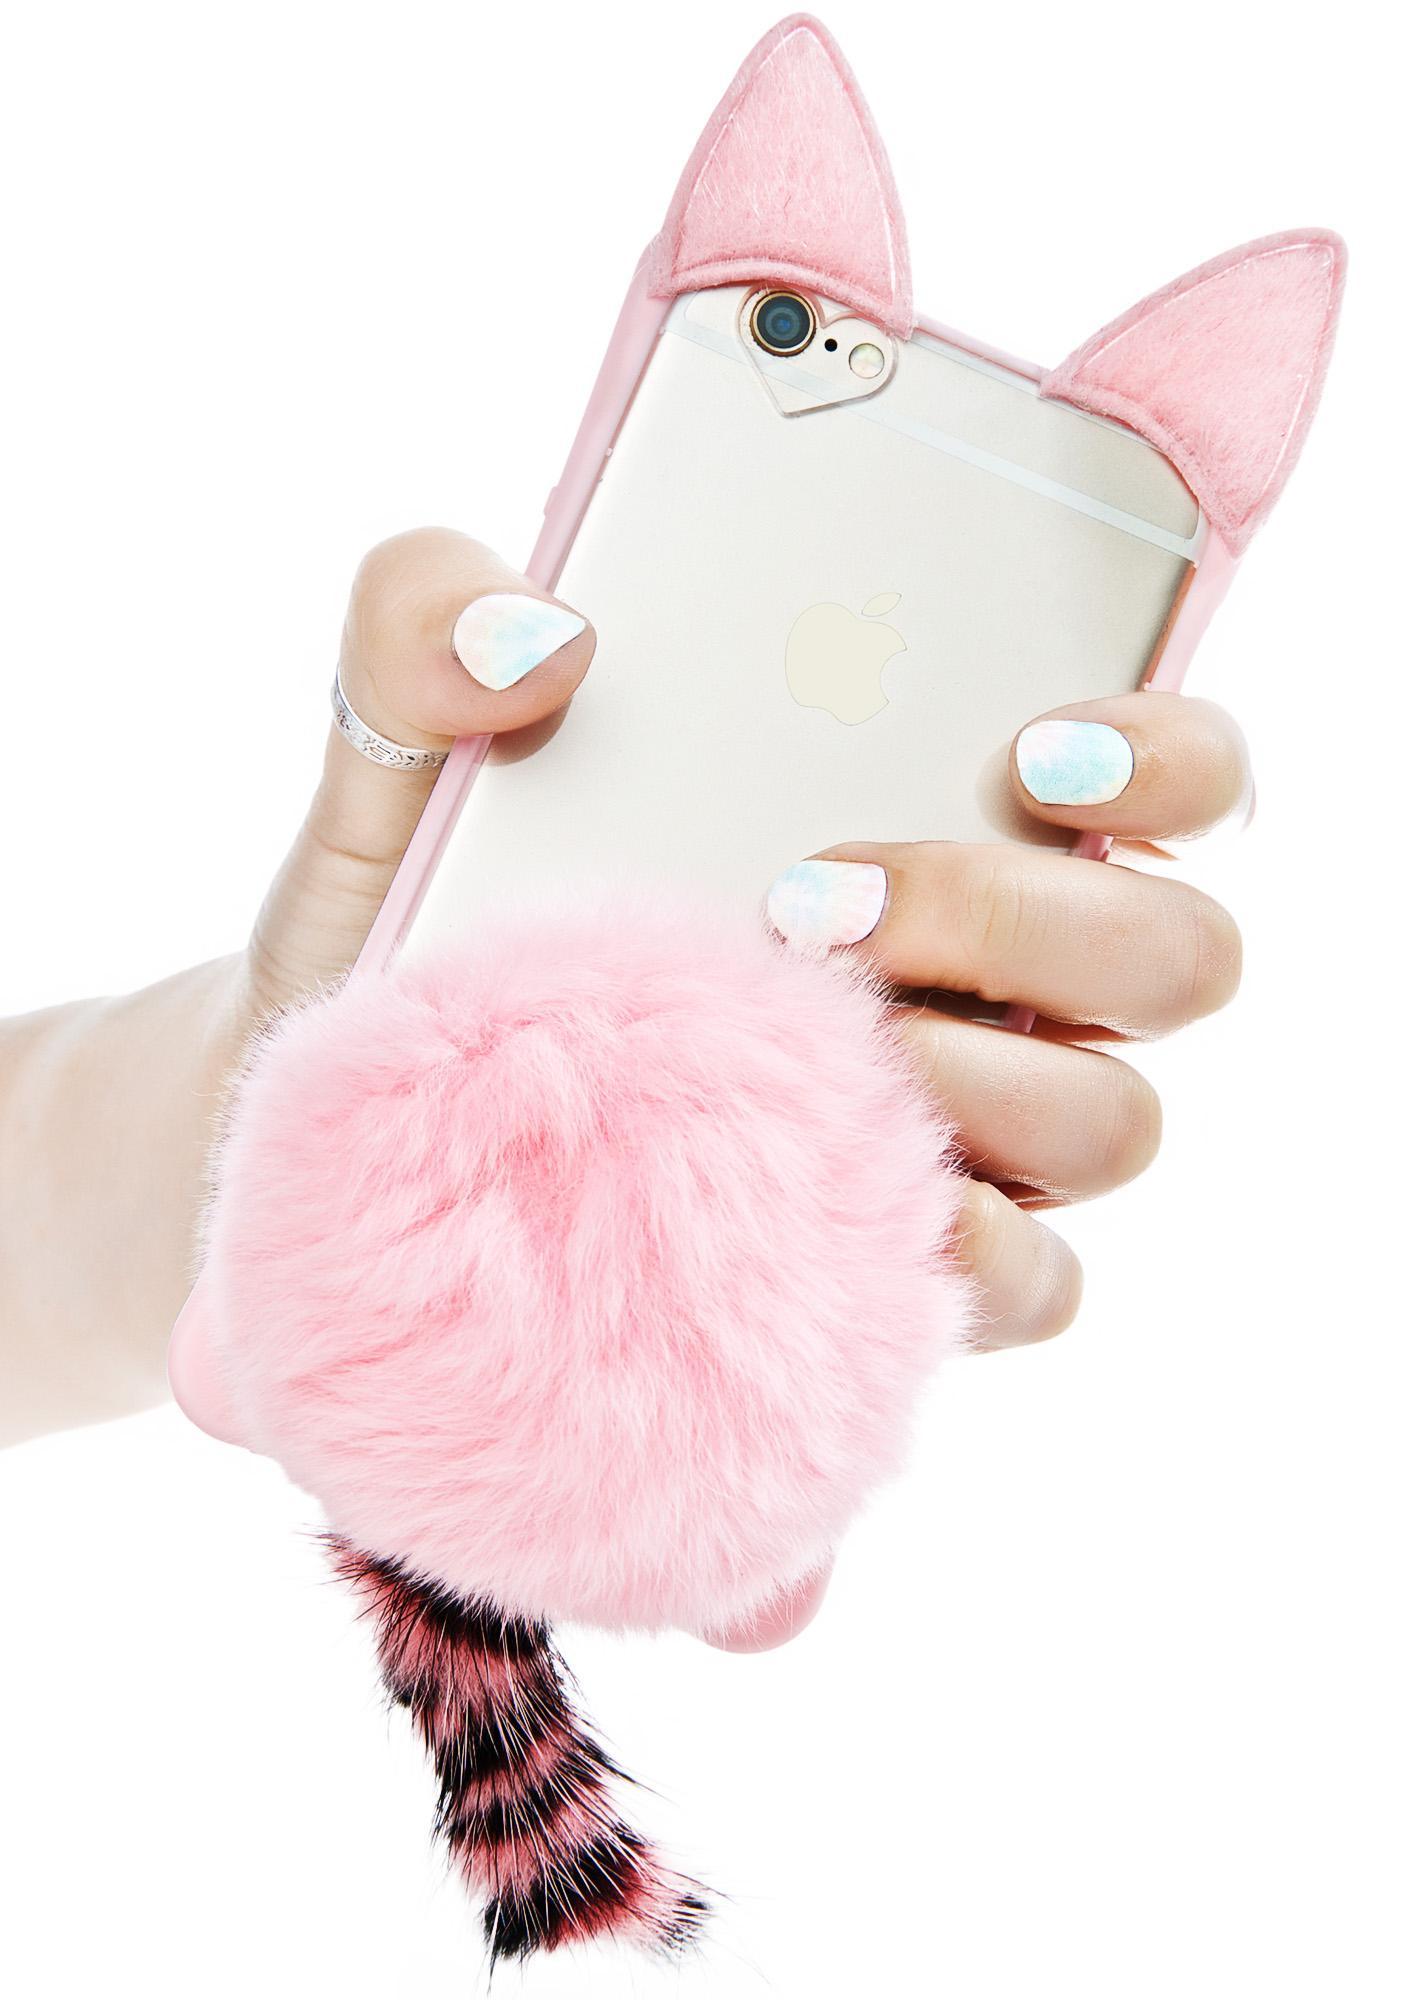 Pinky Fluff Ball iPhone 6/6+ Case